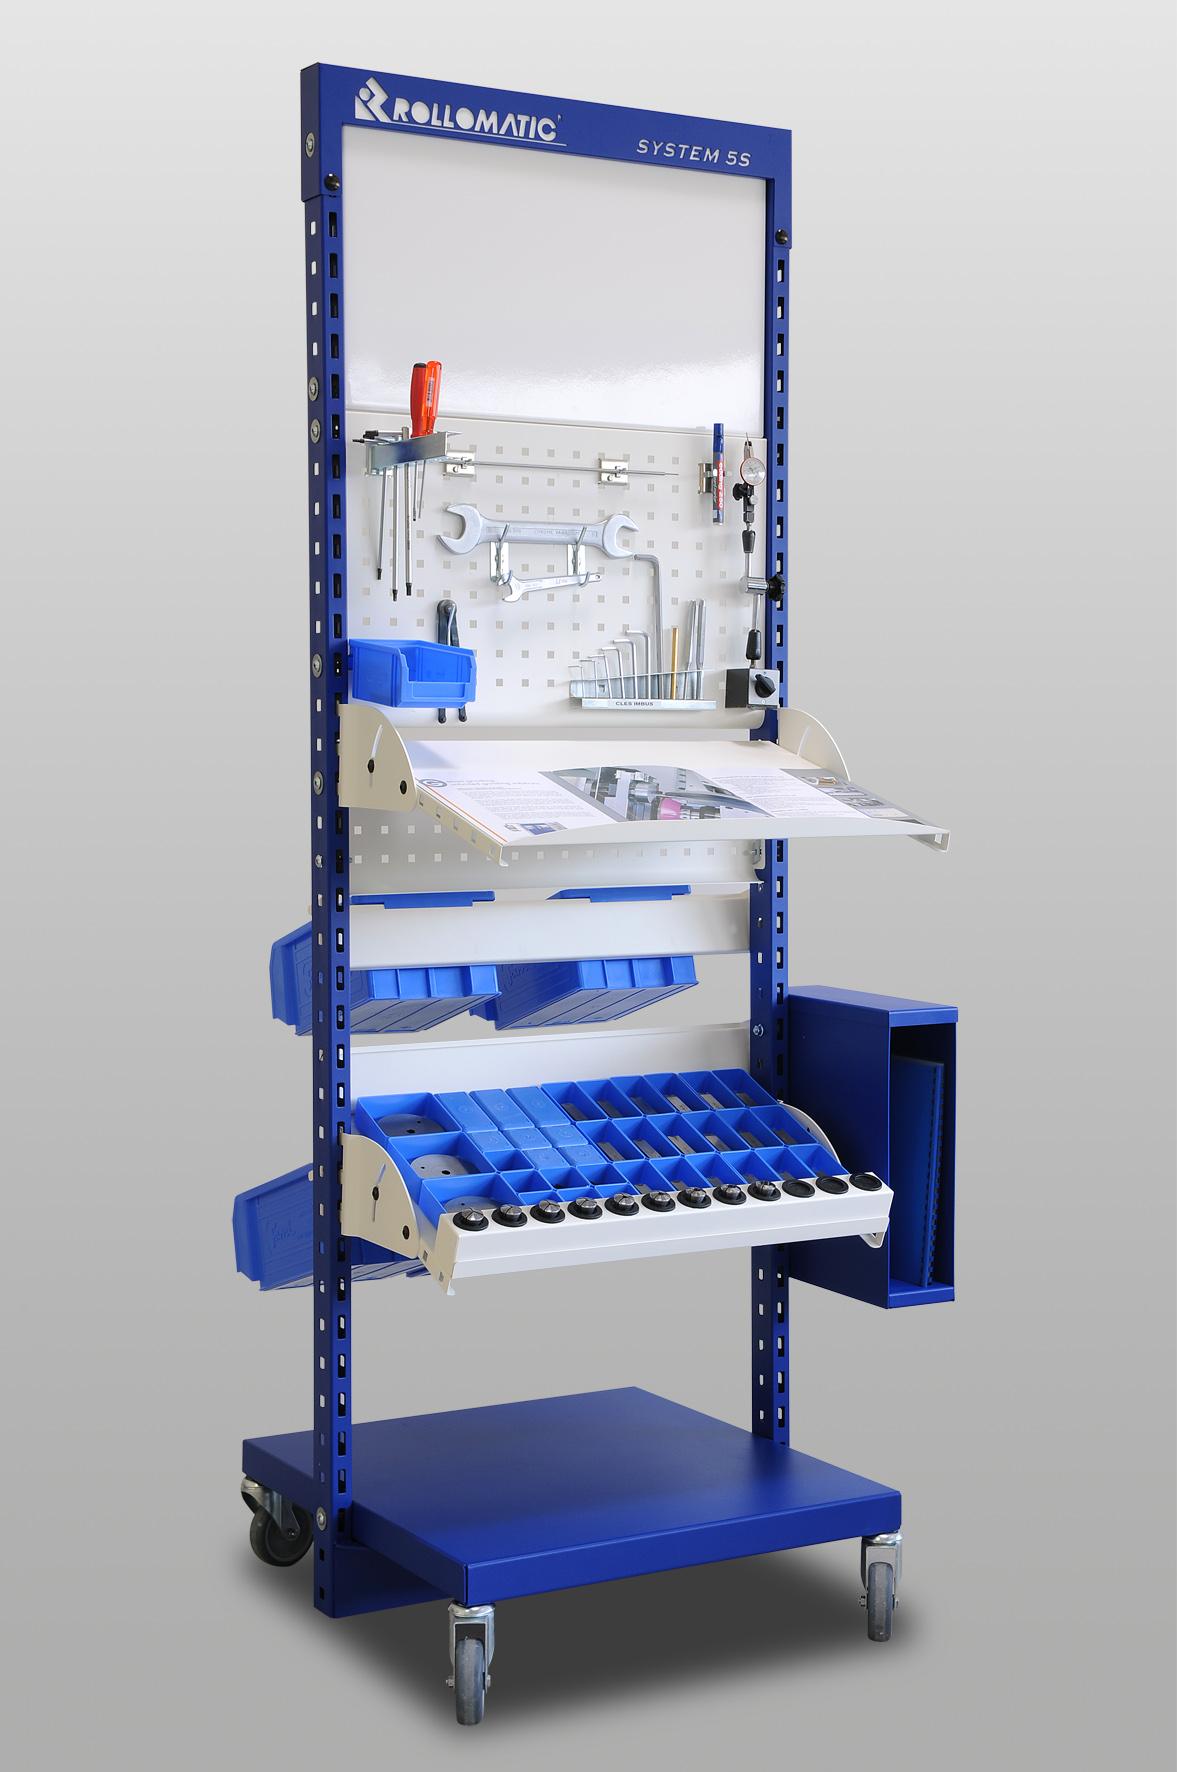 Rollomatic SA – Precision CNC Machines For Cutting Tools